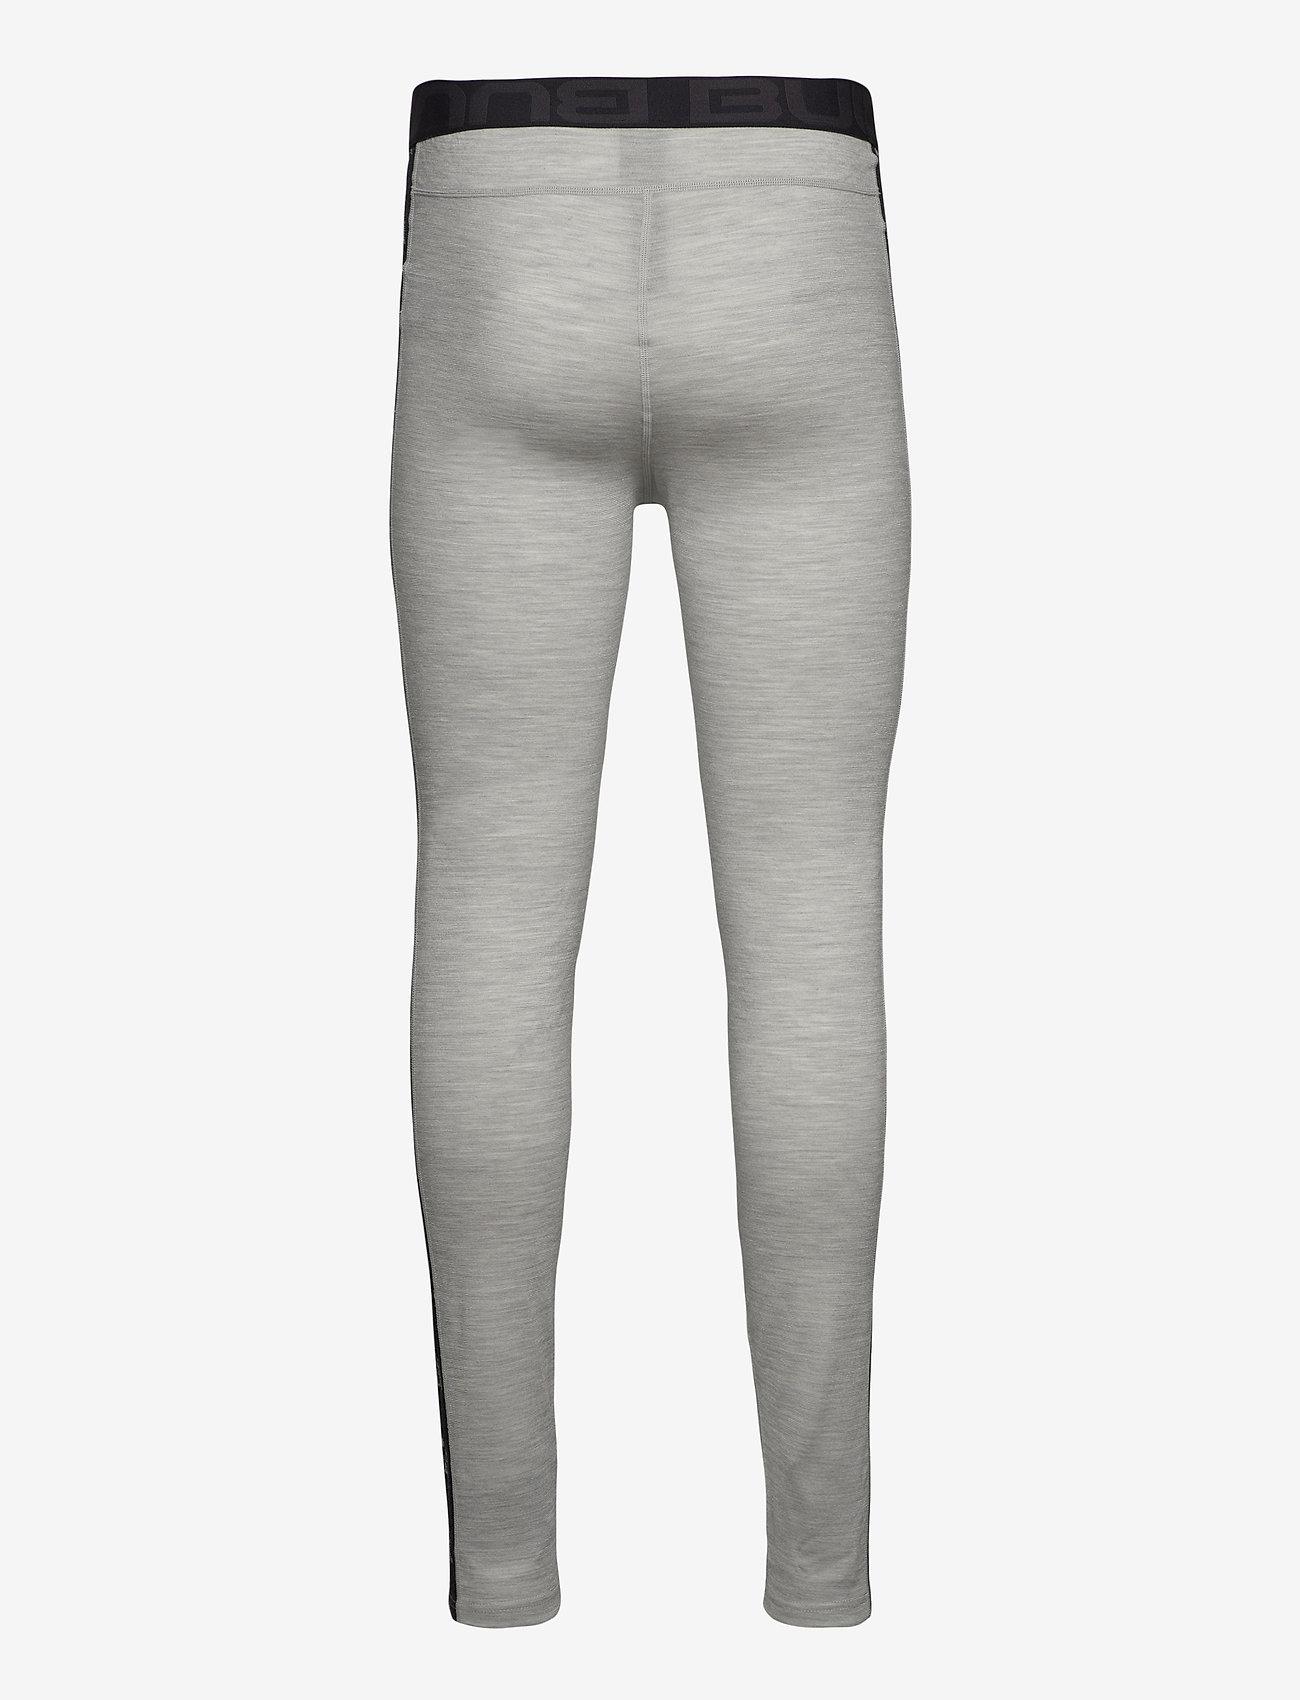 Bula - Tape Merino Wool Pants - funkionsunterwäsche - hosen - greym - 1